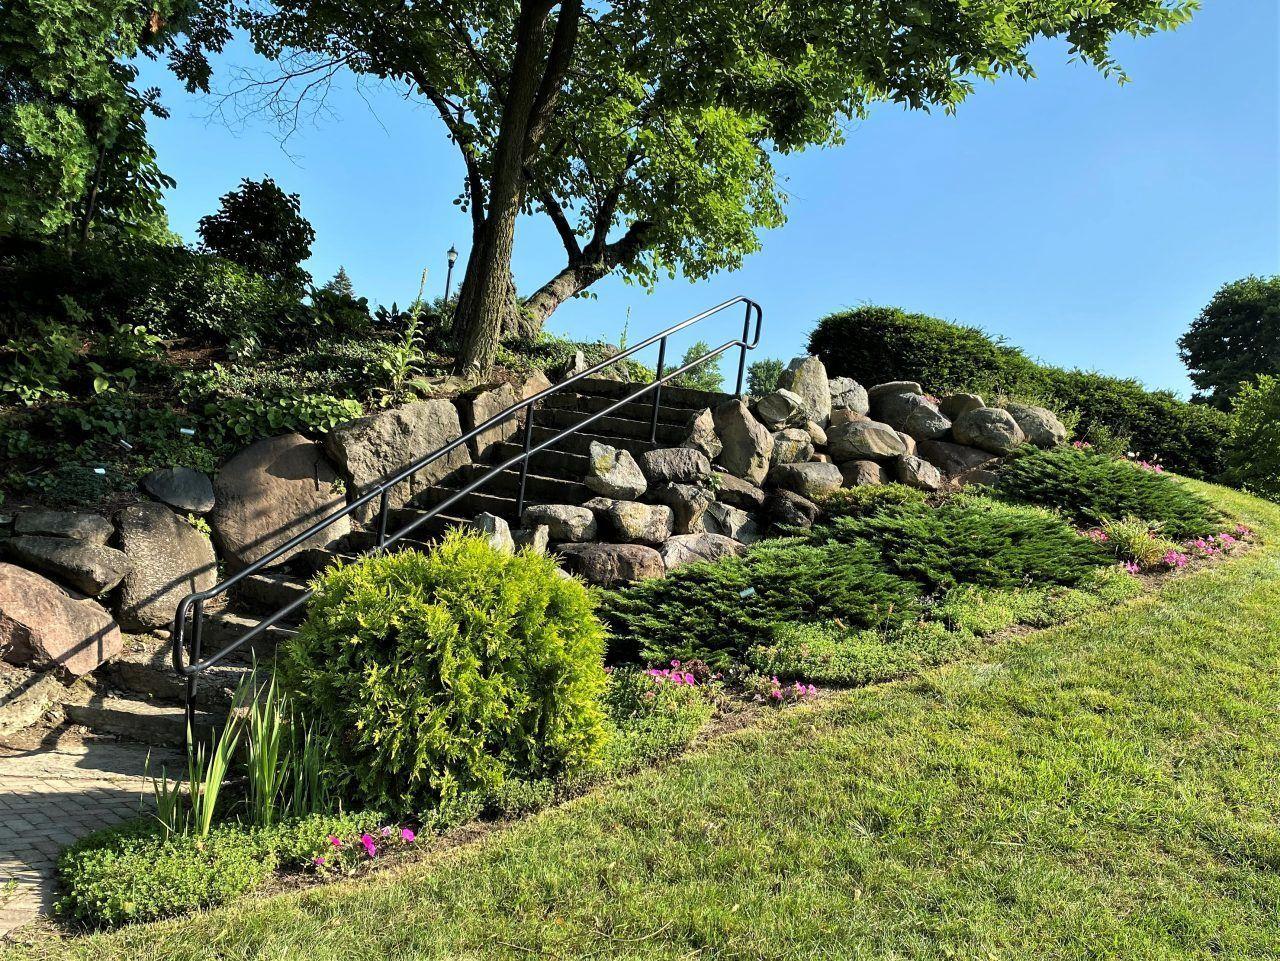 12. C.B. Davis Memorial Boulder Garden